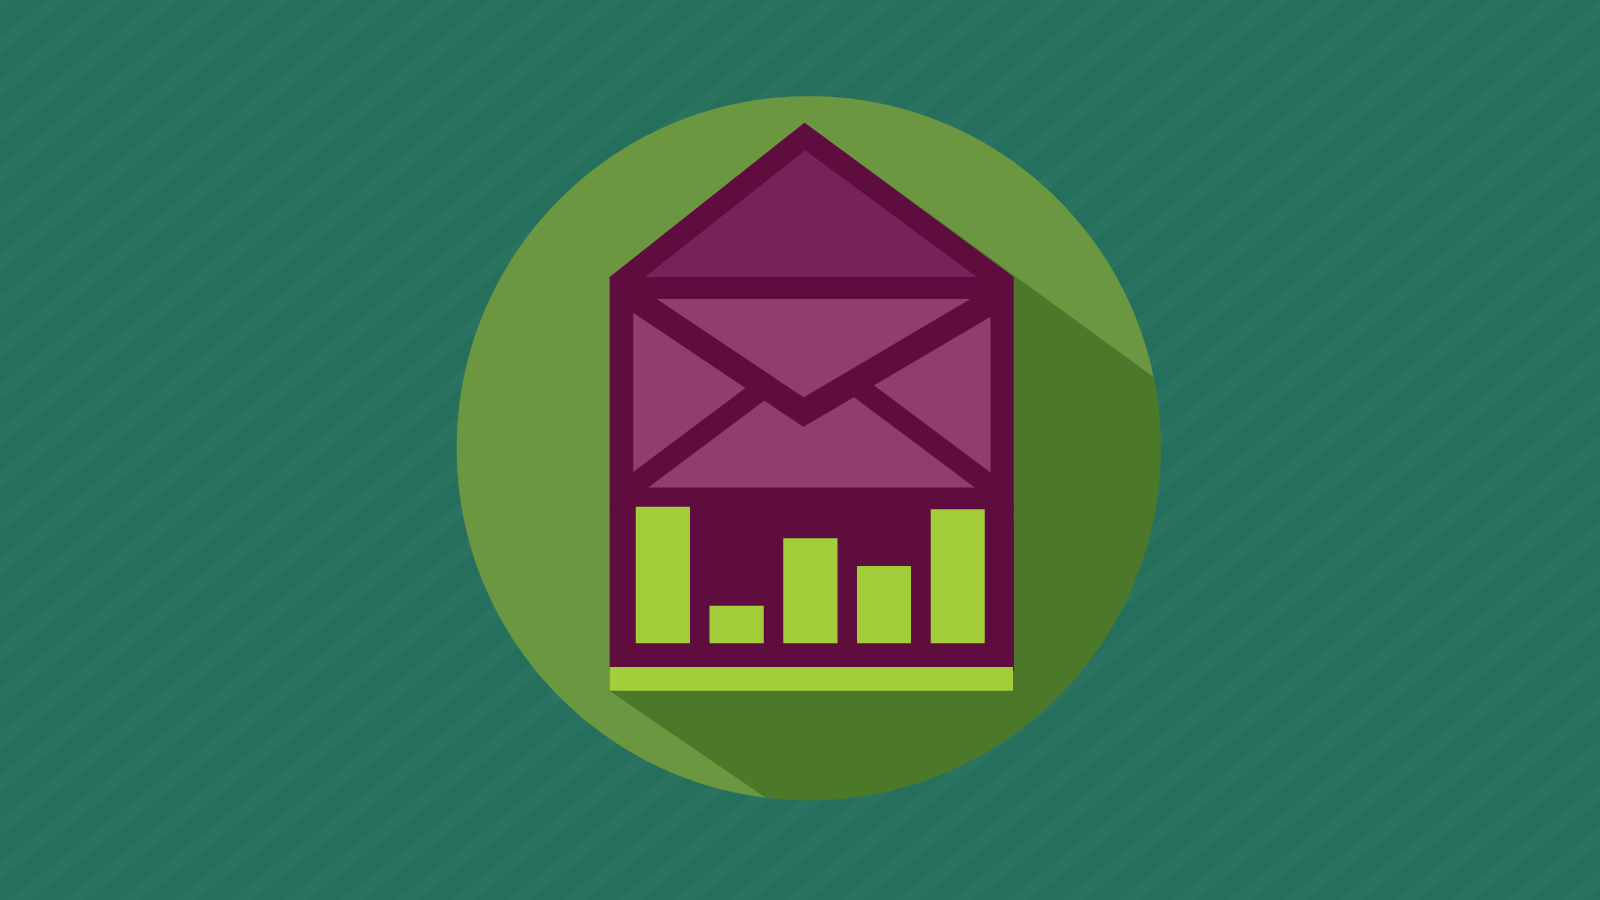 bar graph and envelope illustrating email data